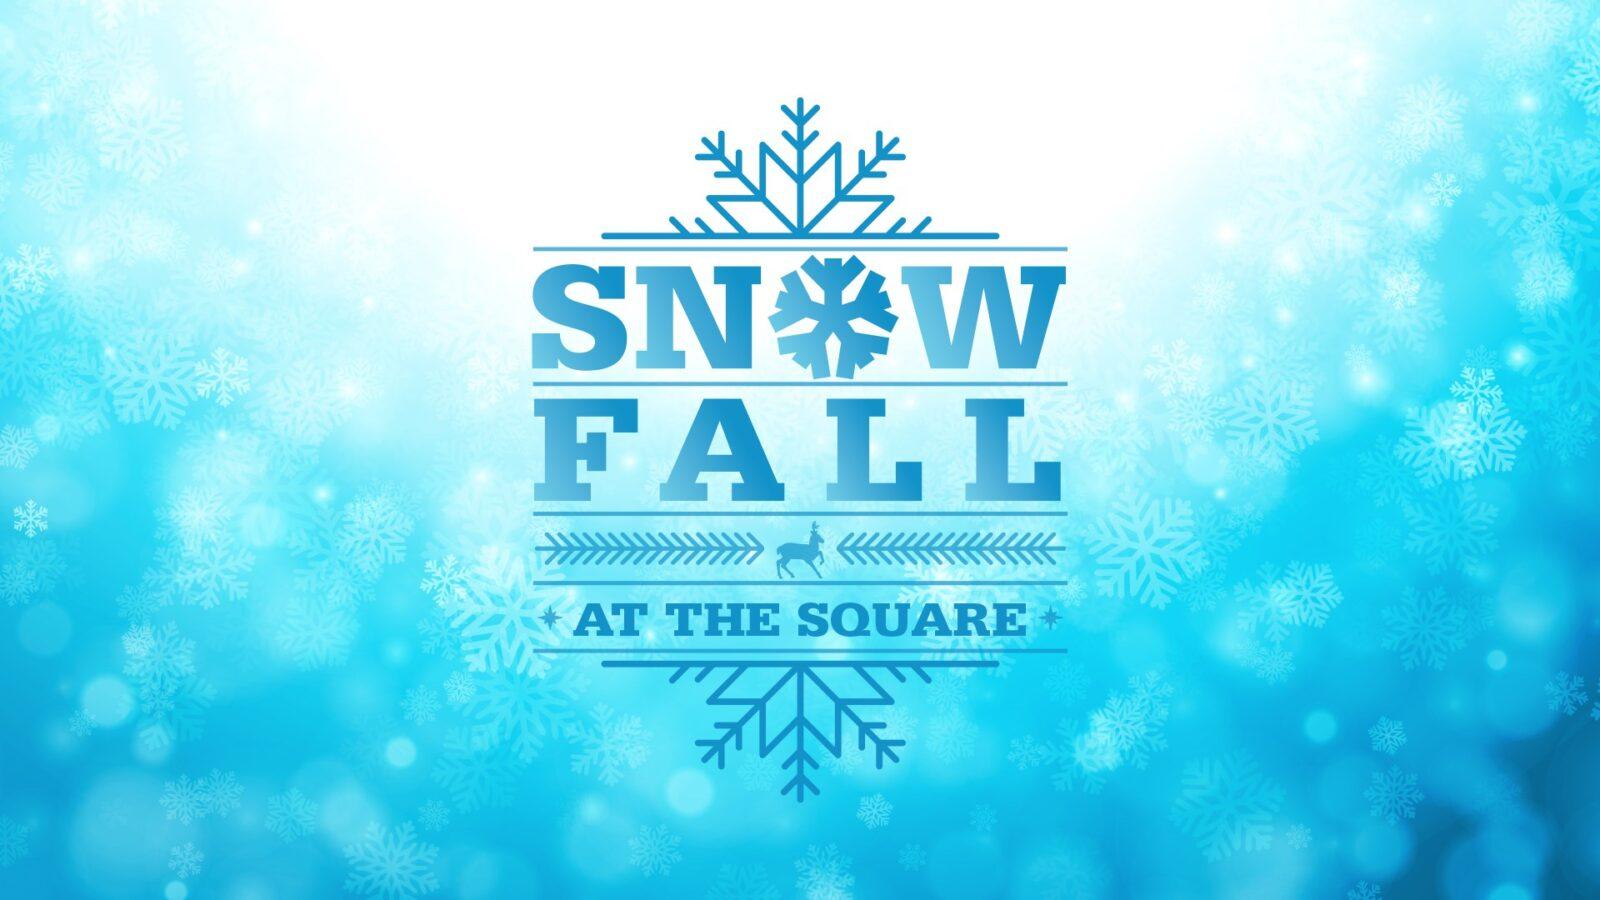 Snowfall on The Square at Memorial City